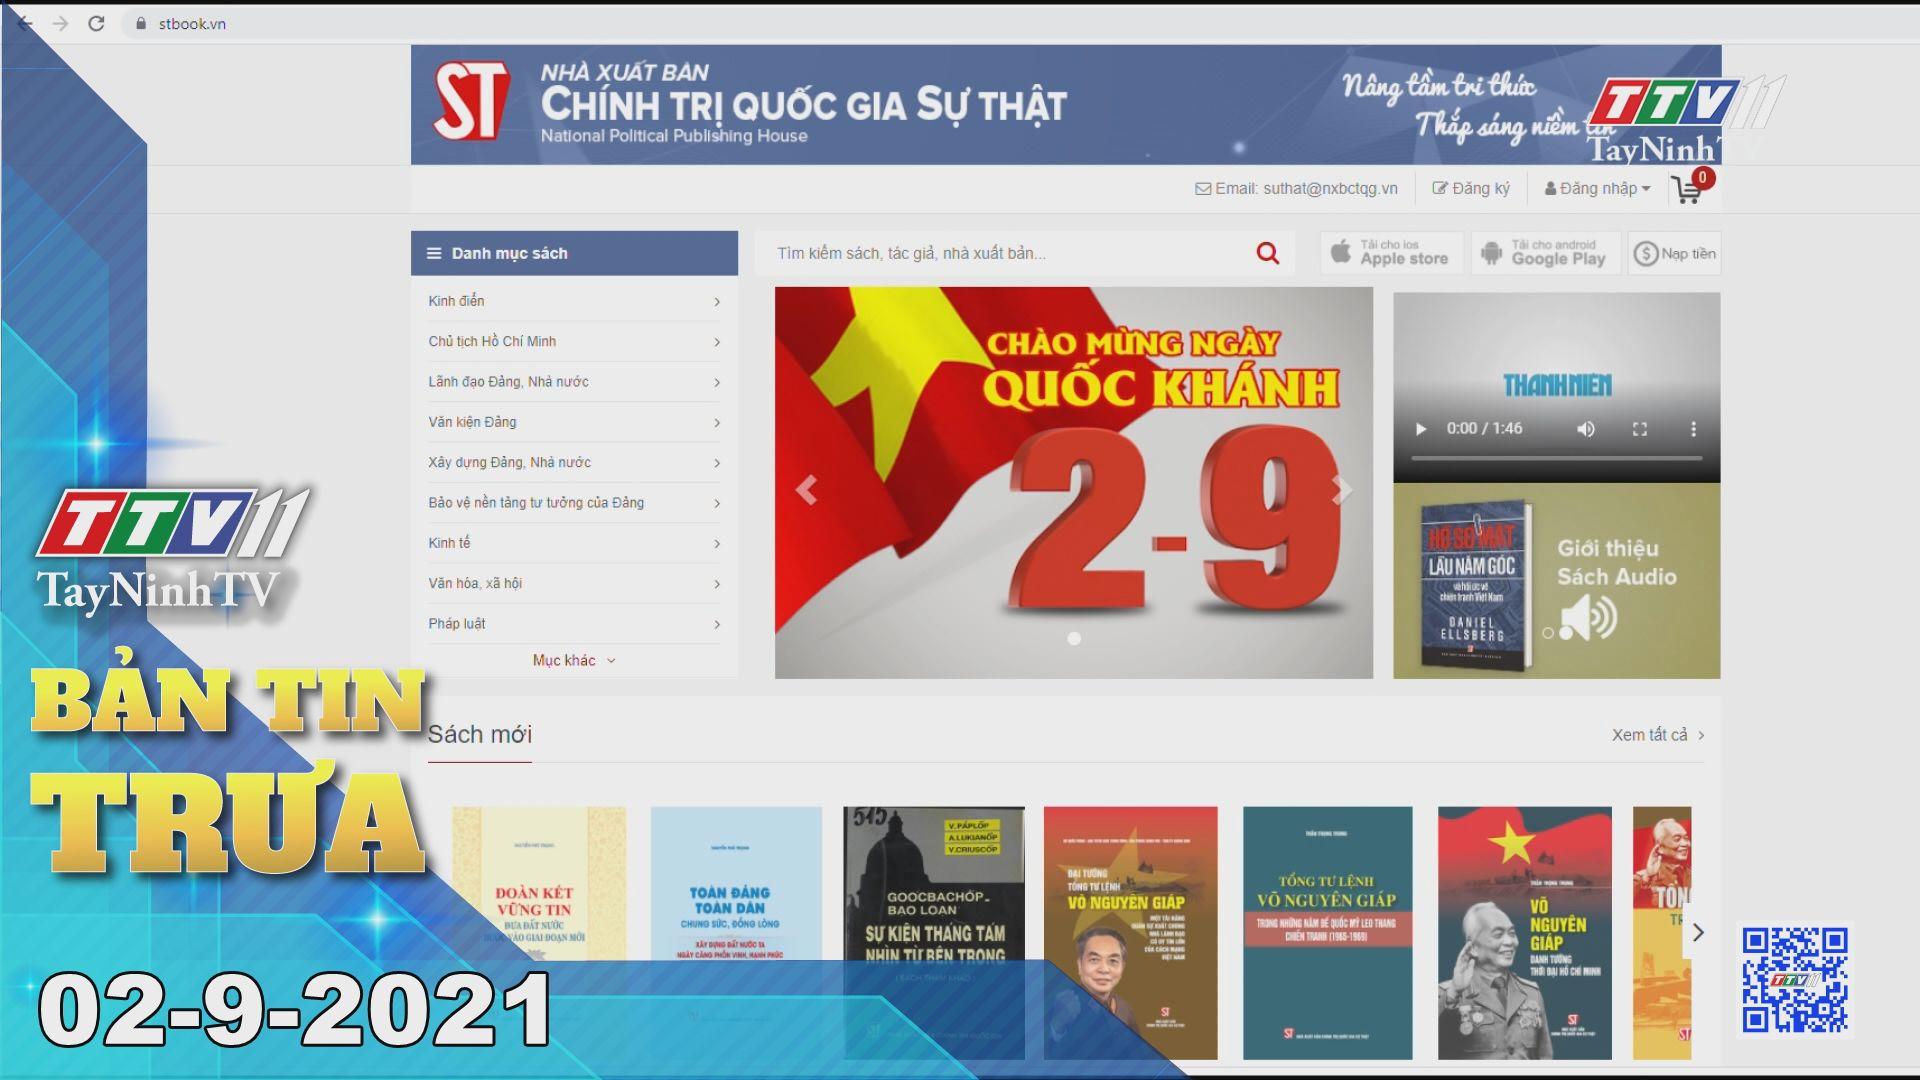 Bản tin trưa 02-9-2021 | Tin tức hôm nay | TayNinhTV